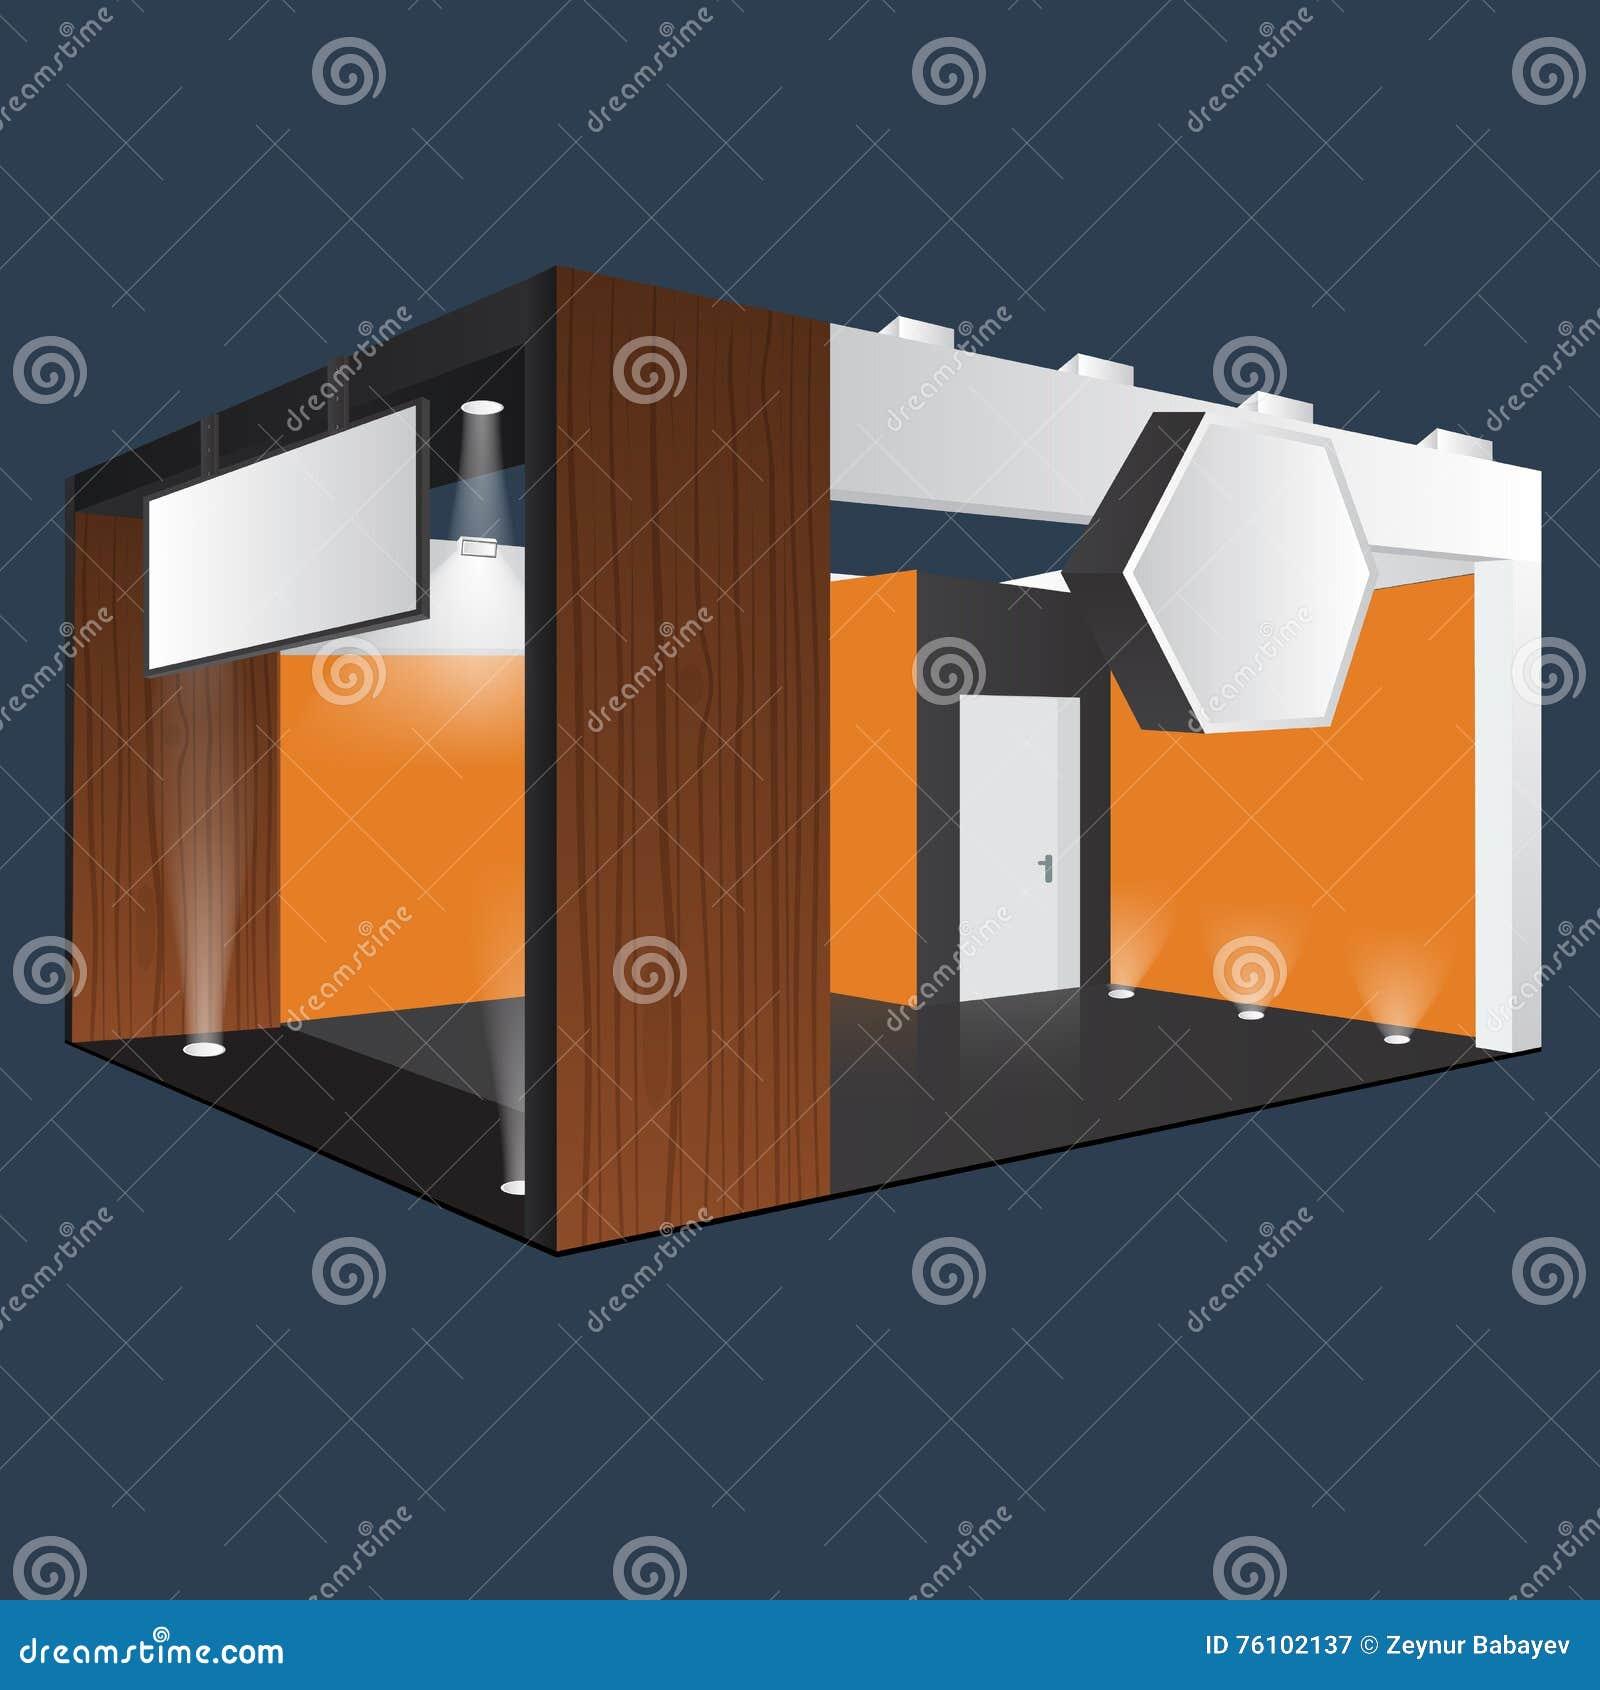 Exhibition Stand Design Furniture : Creative exhibition stand design booth template corporate